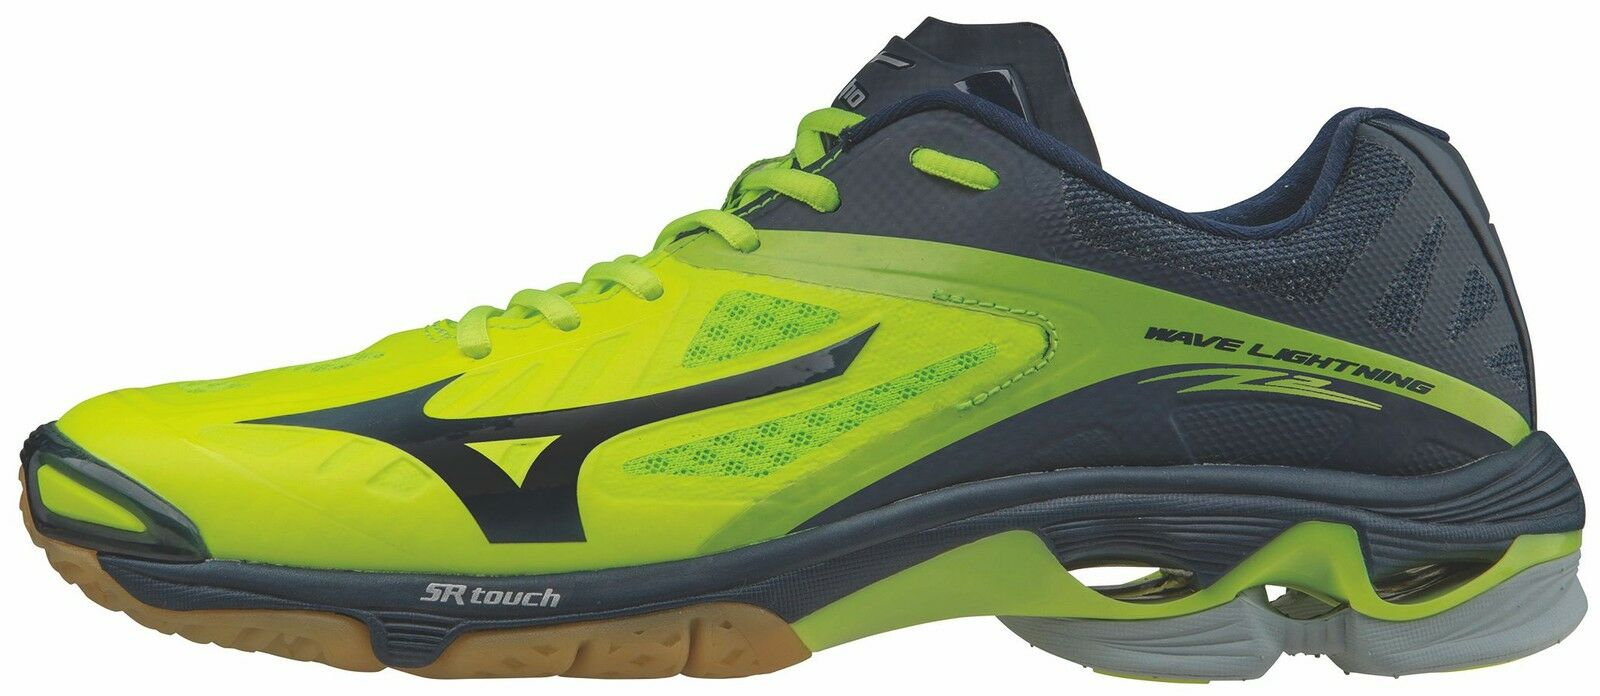 Chaussure voleibol Mizuno Wave Lightning Z2 Bajo Hombre V1GA160044